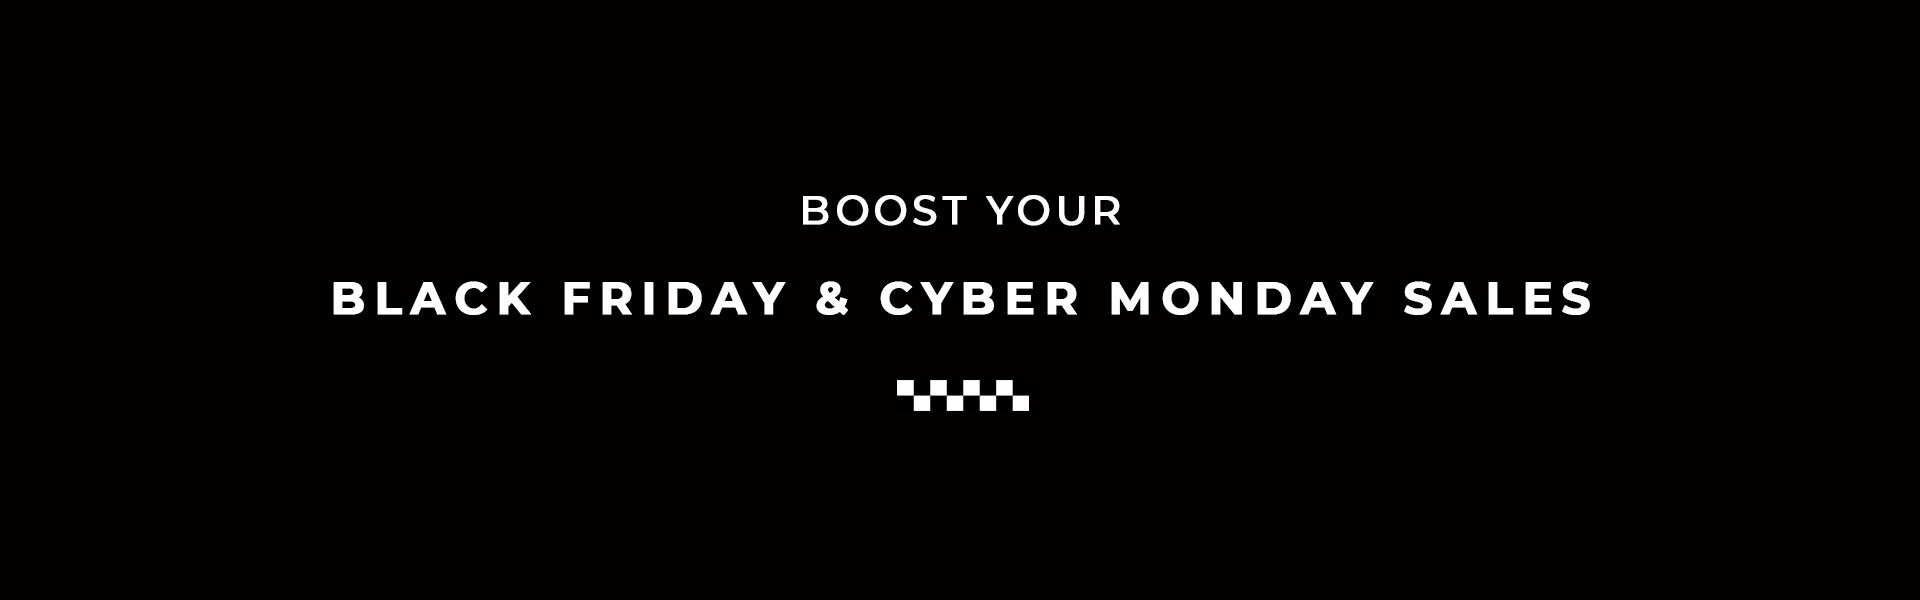 Born Intelligence, Black Friday, Black Friday Sale, Black Friday Marketing, Cyber Monday, Cyber Monday Sale, Cyber Monday Marketing, Make Sales, How to make sales,